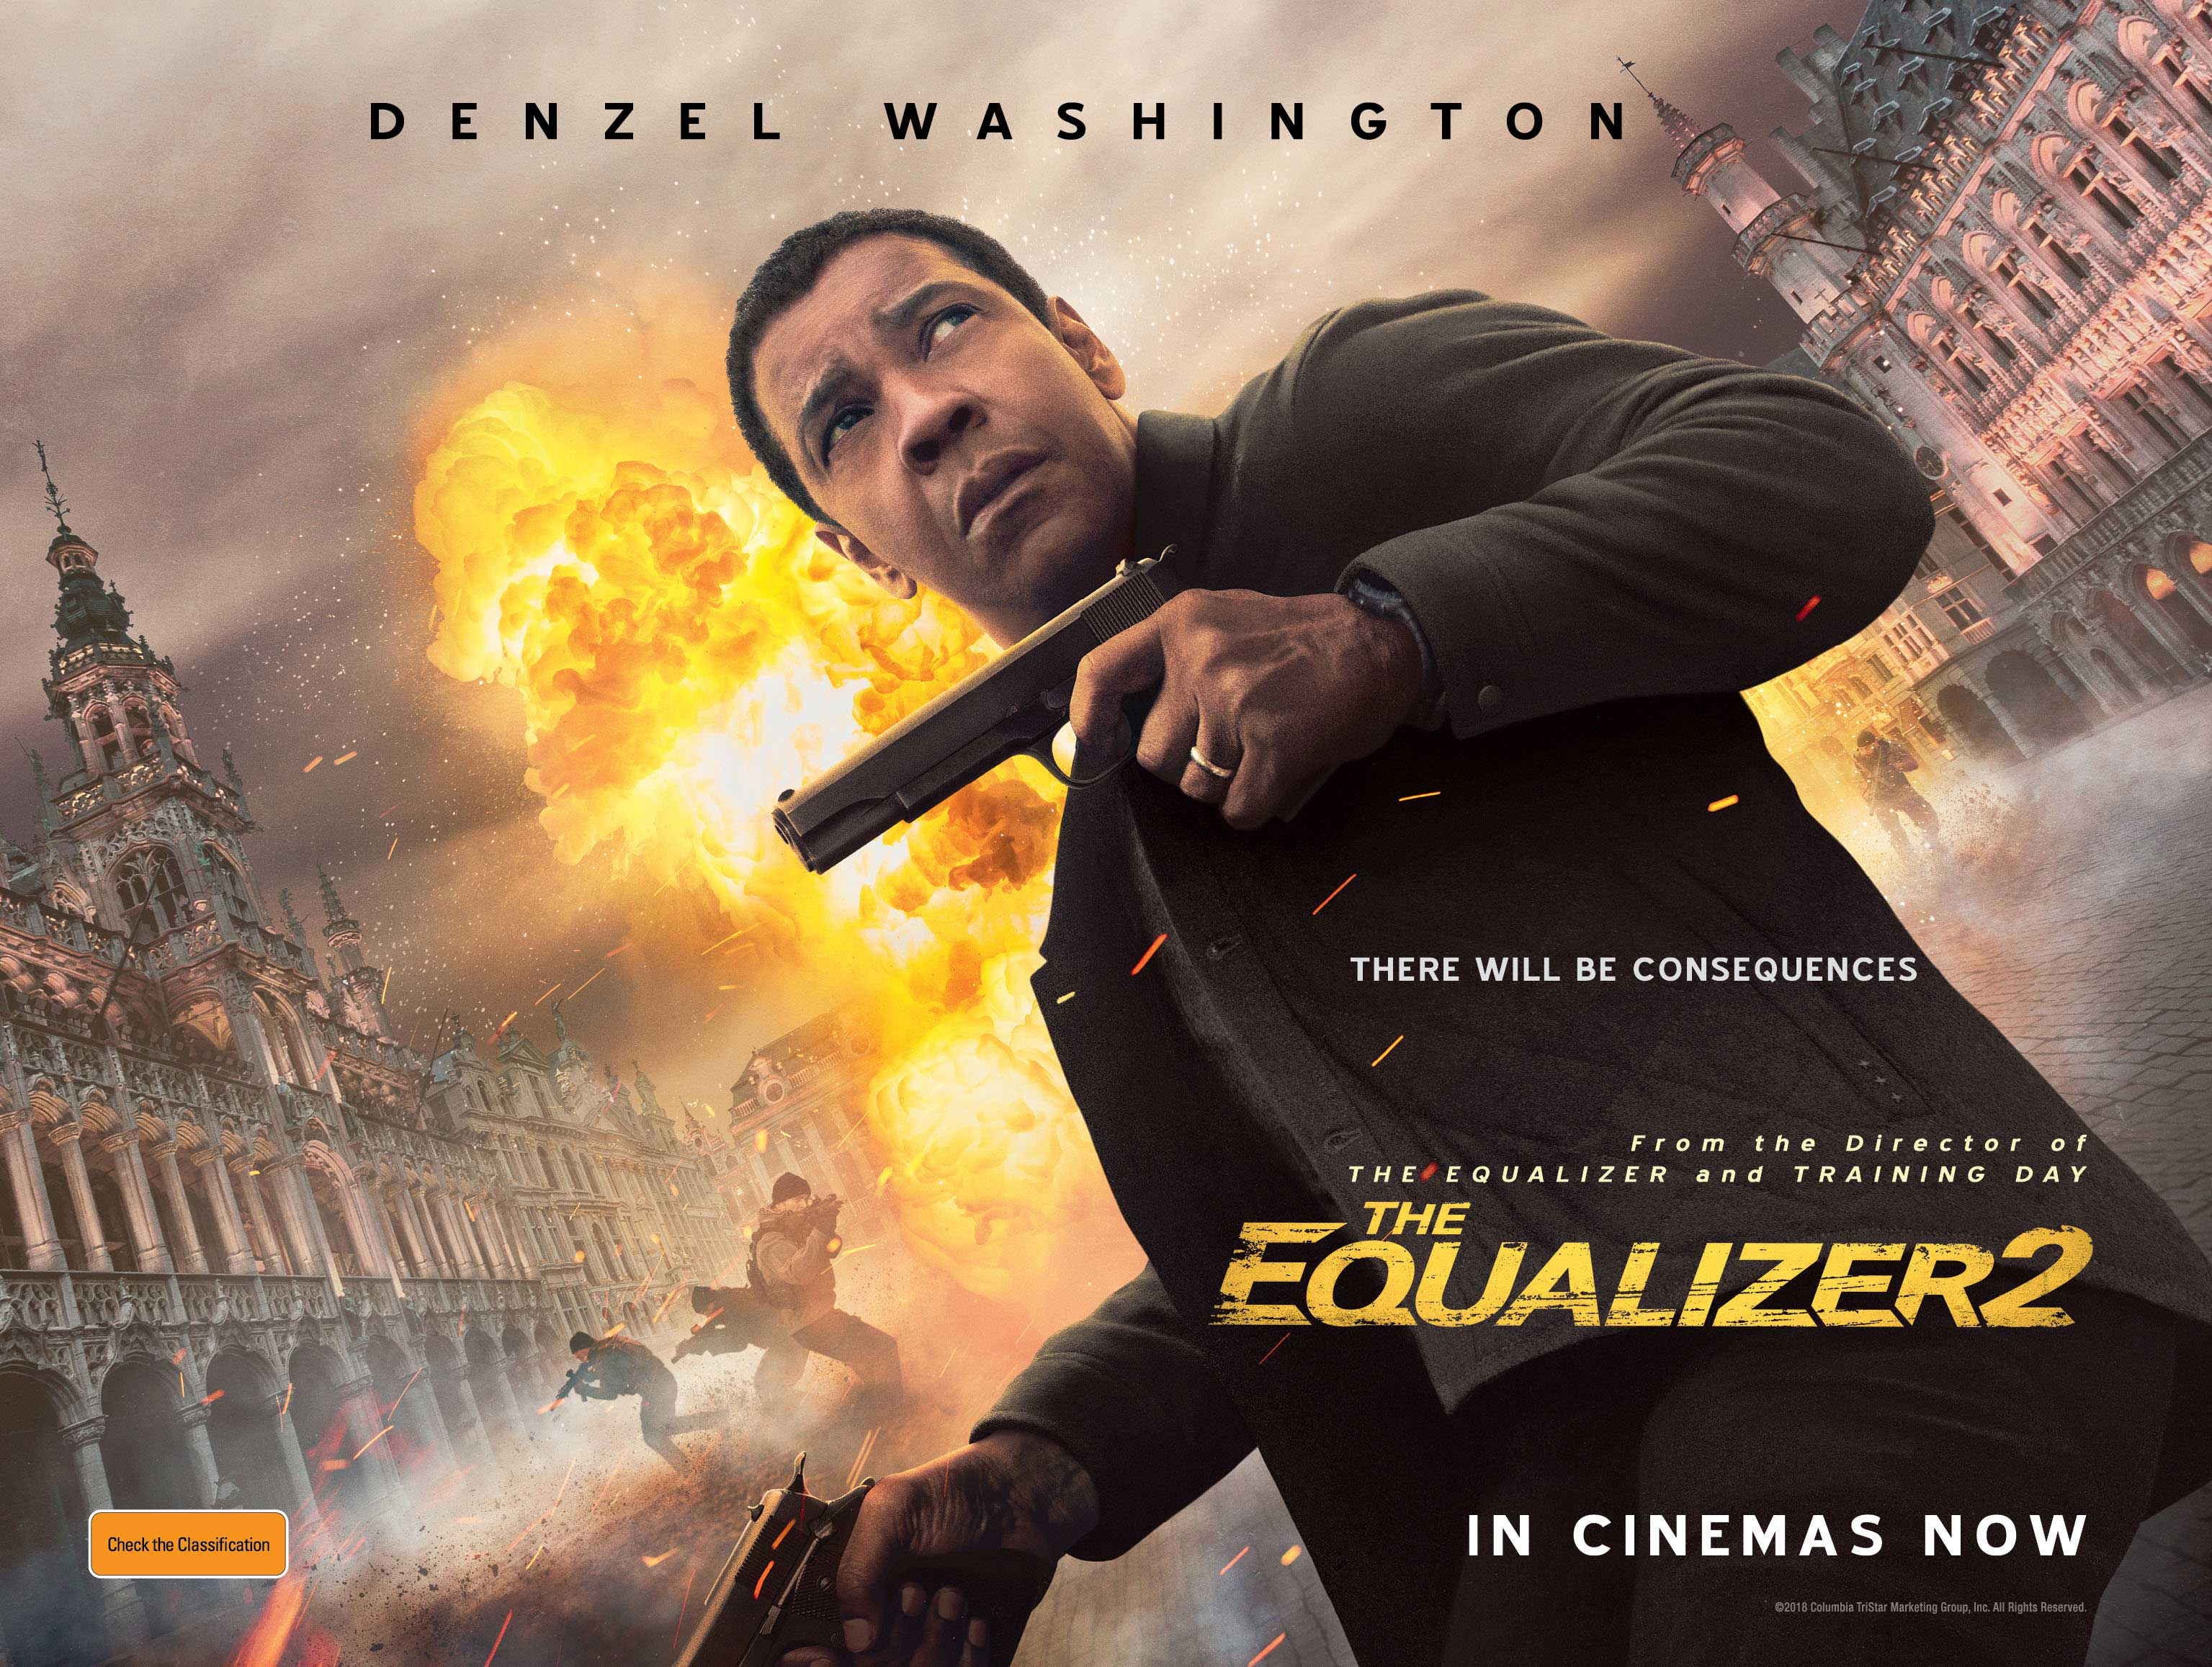 Denzel Washington افلام ومسلسلات موسوعه الافلام ويكي ان